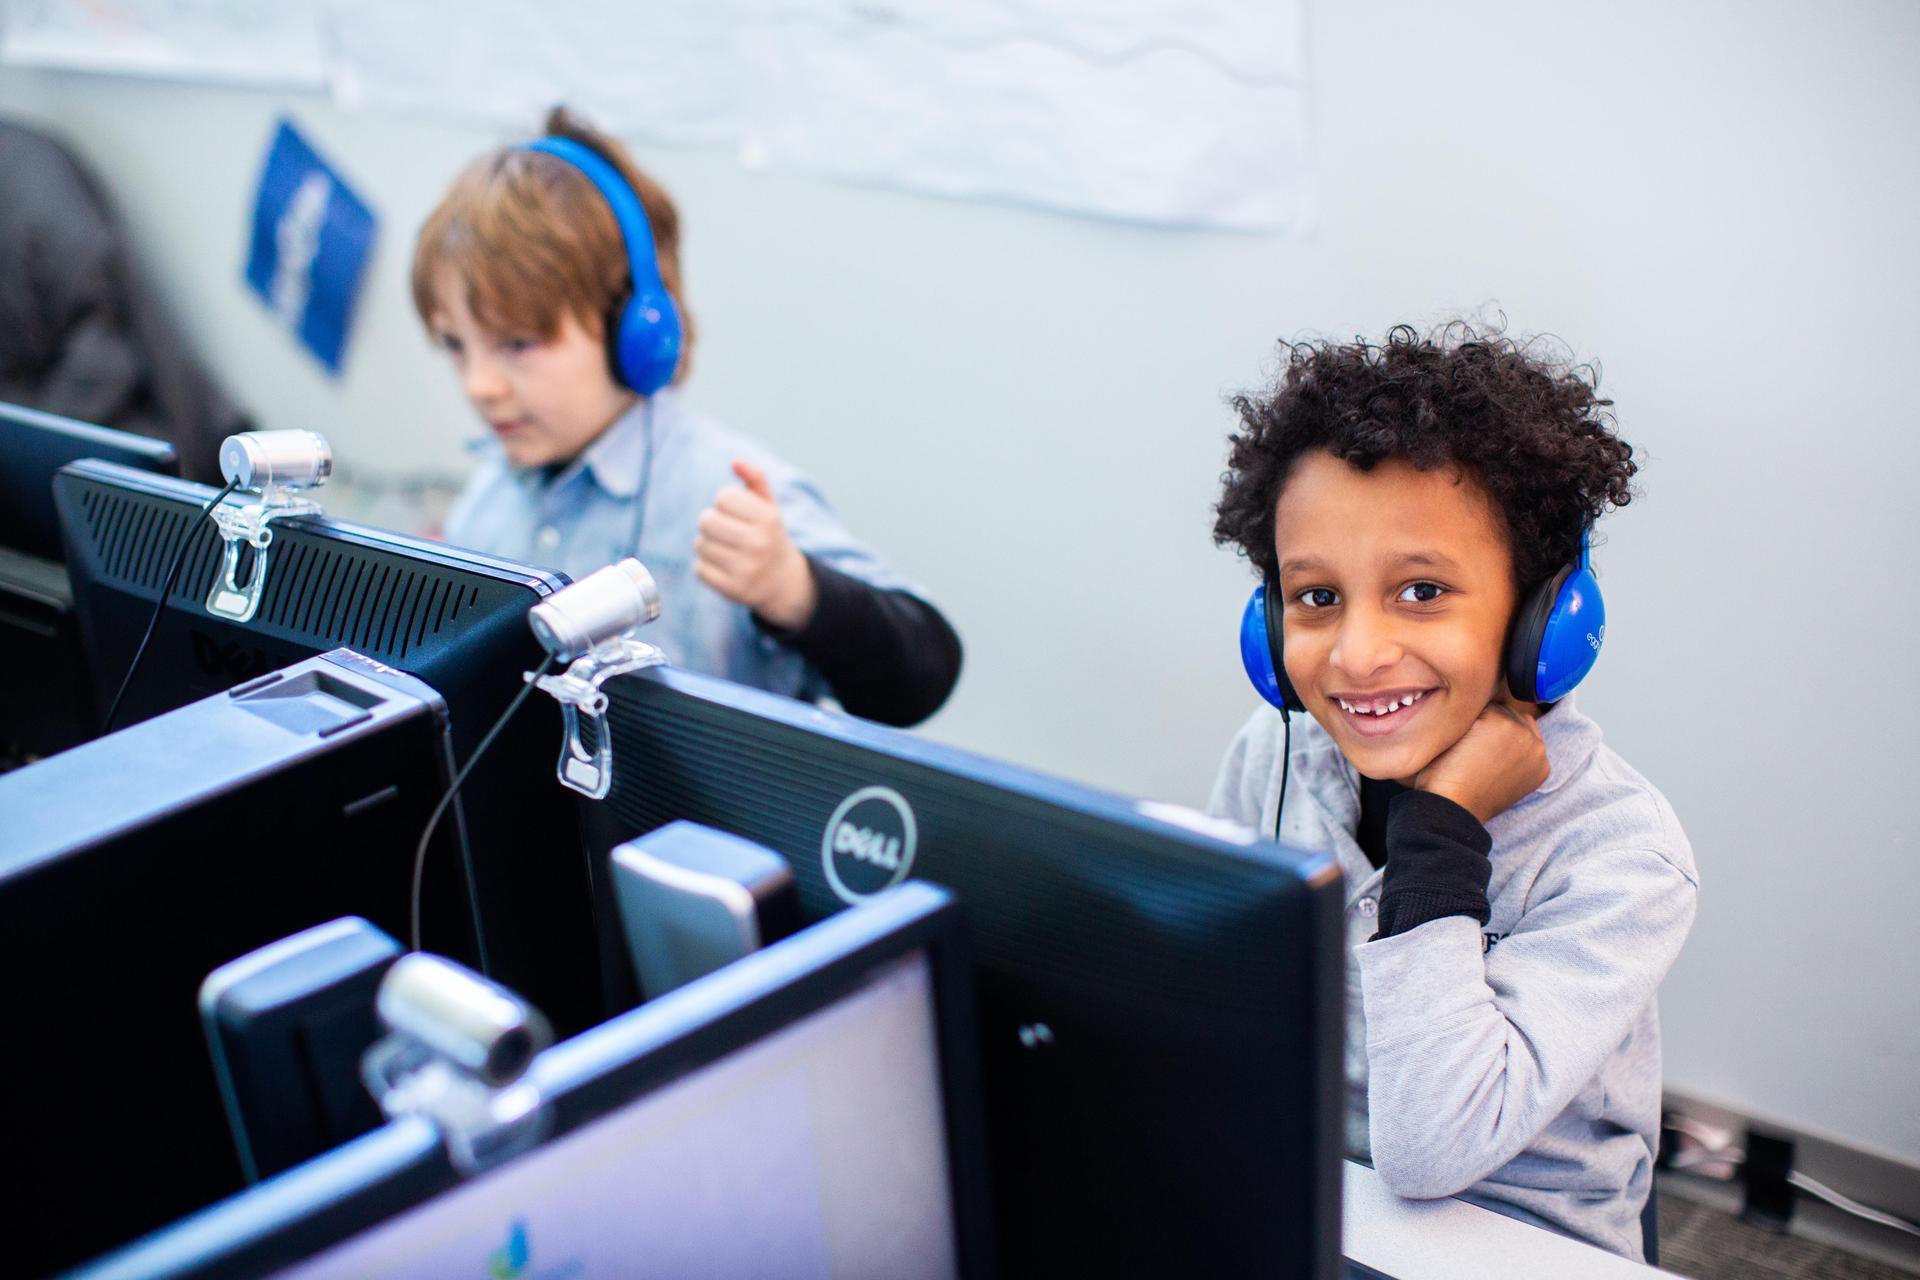 Scholar using a computer